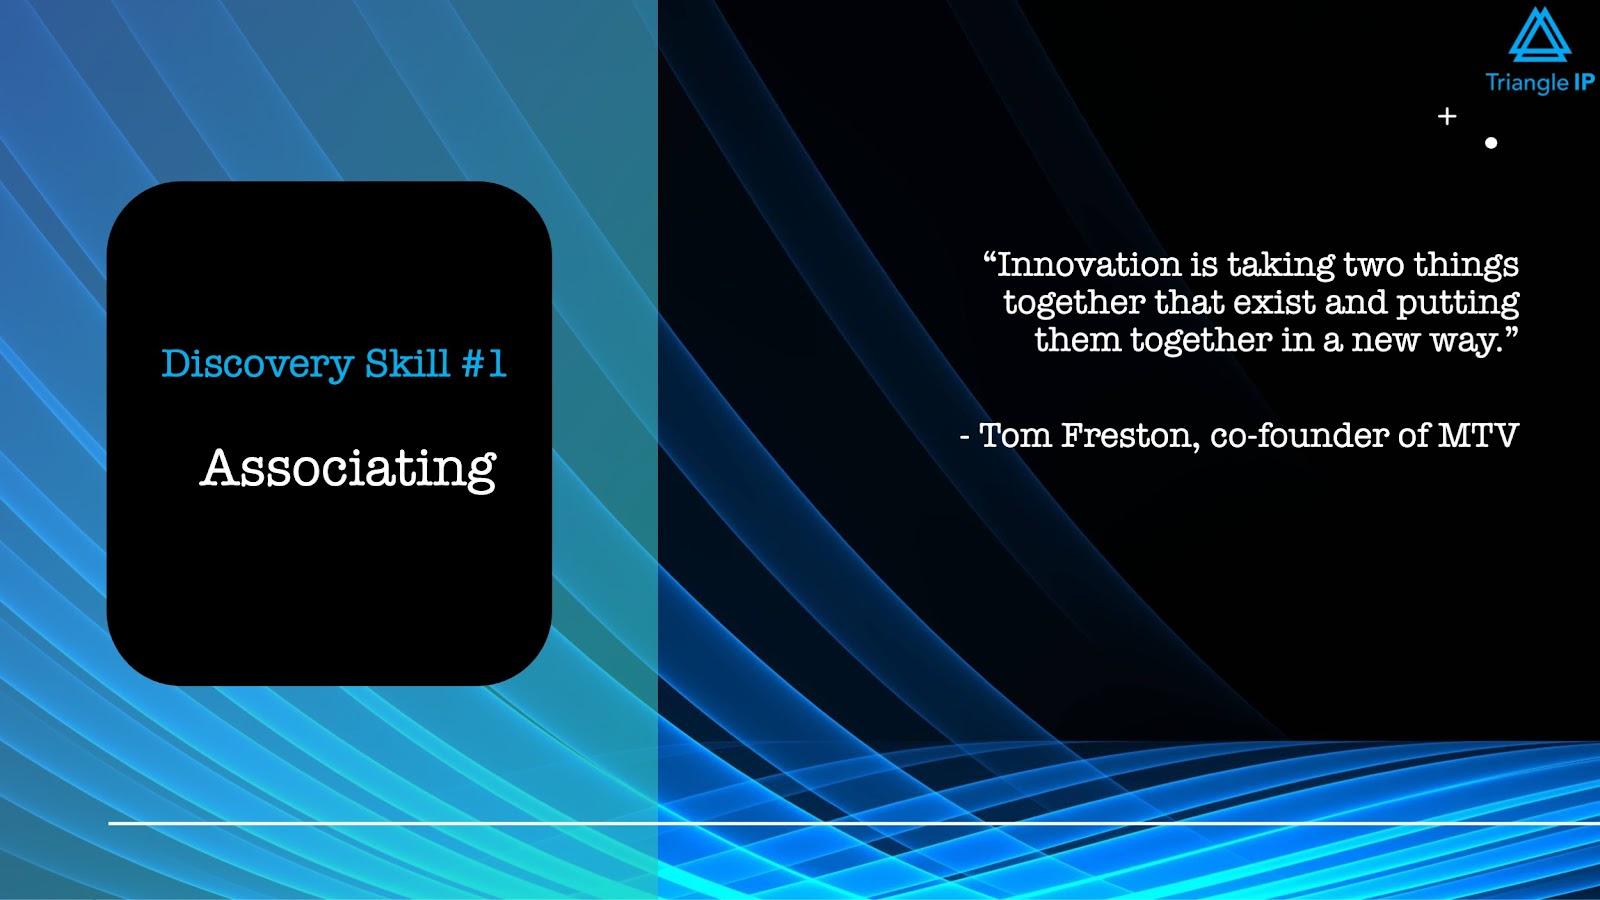 Disruptive Innovators | Discovery Skill #1 Associating